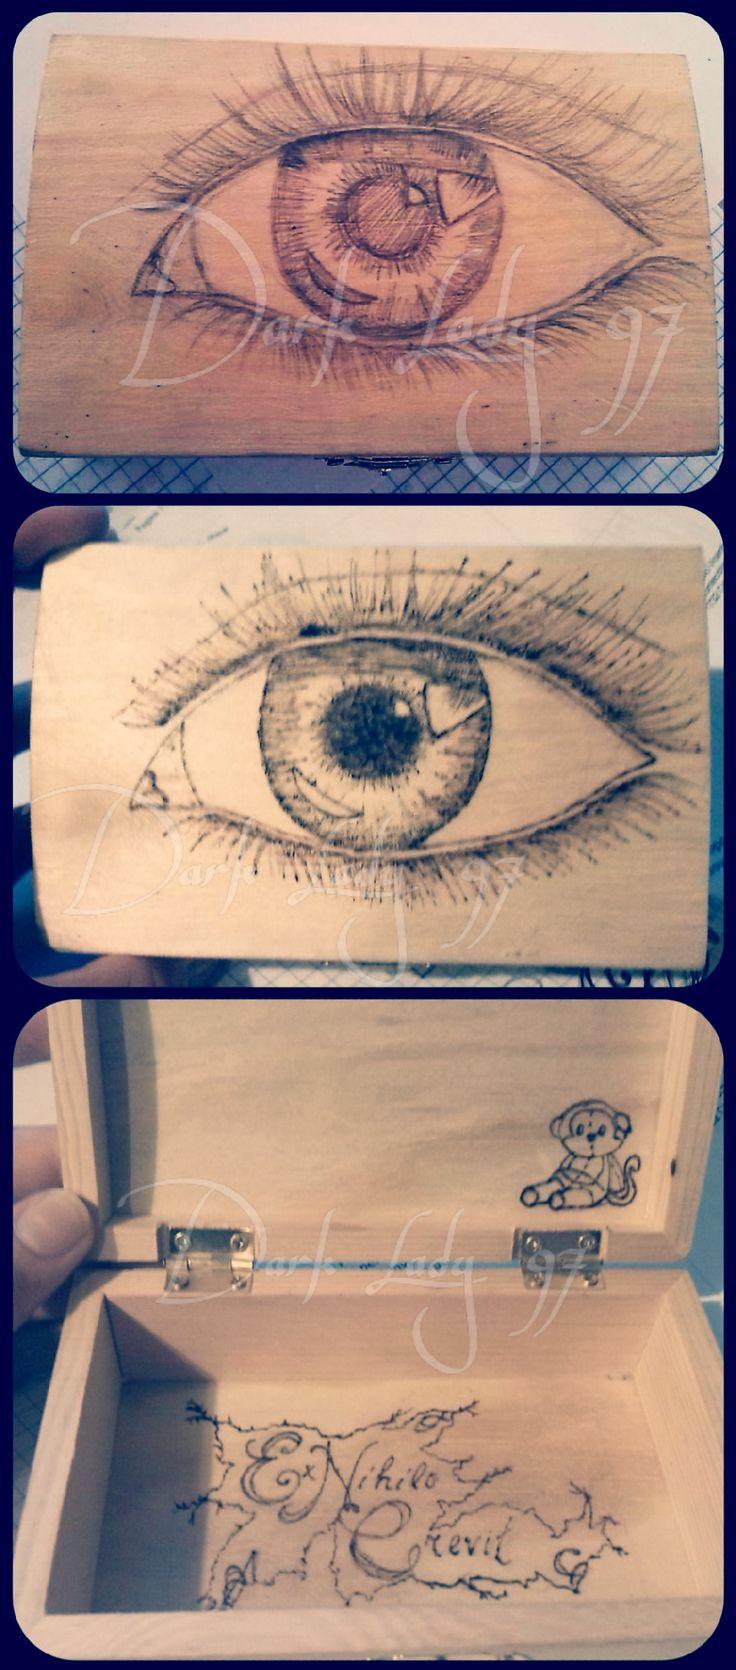 casket wood pyrography eye monkey ex nihilo crevit by Chiara Rigoni // Dark Lady 97